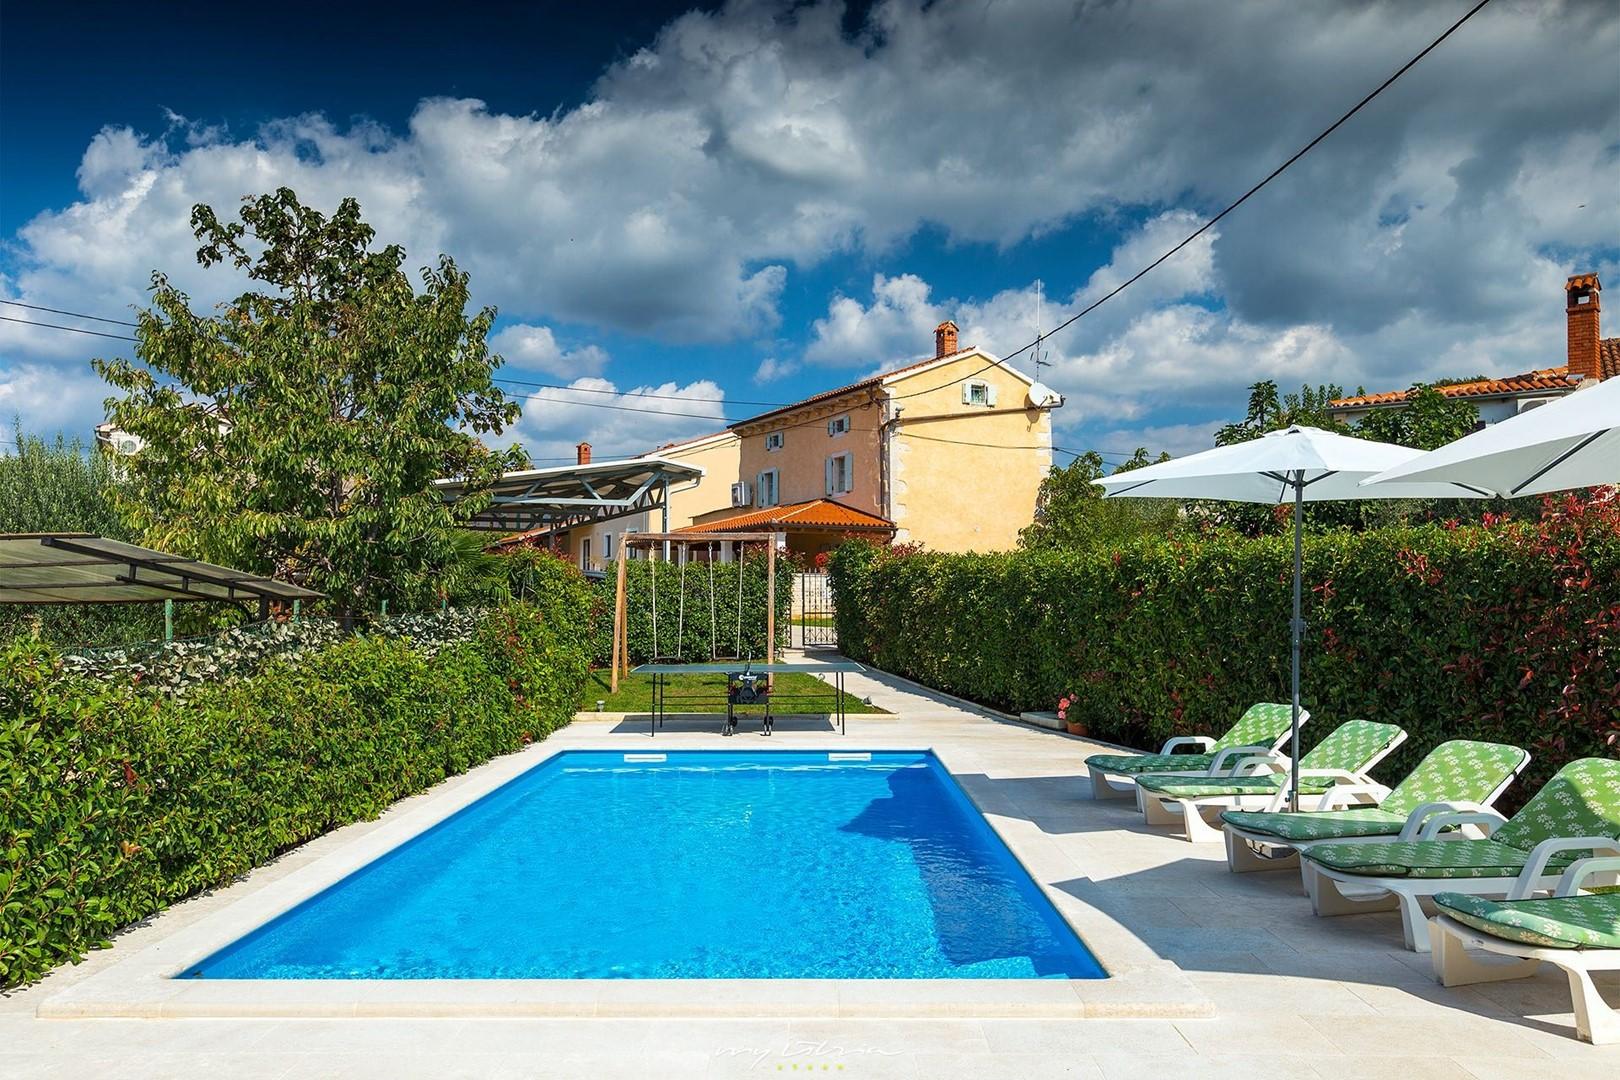 Ferienhaus Villa Bubani / private pool (860332), Kanfanar, , Istrien, Kroatien, Bild 1